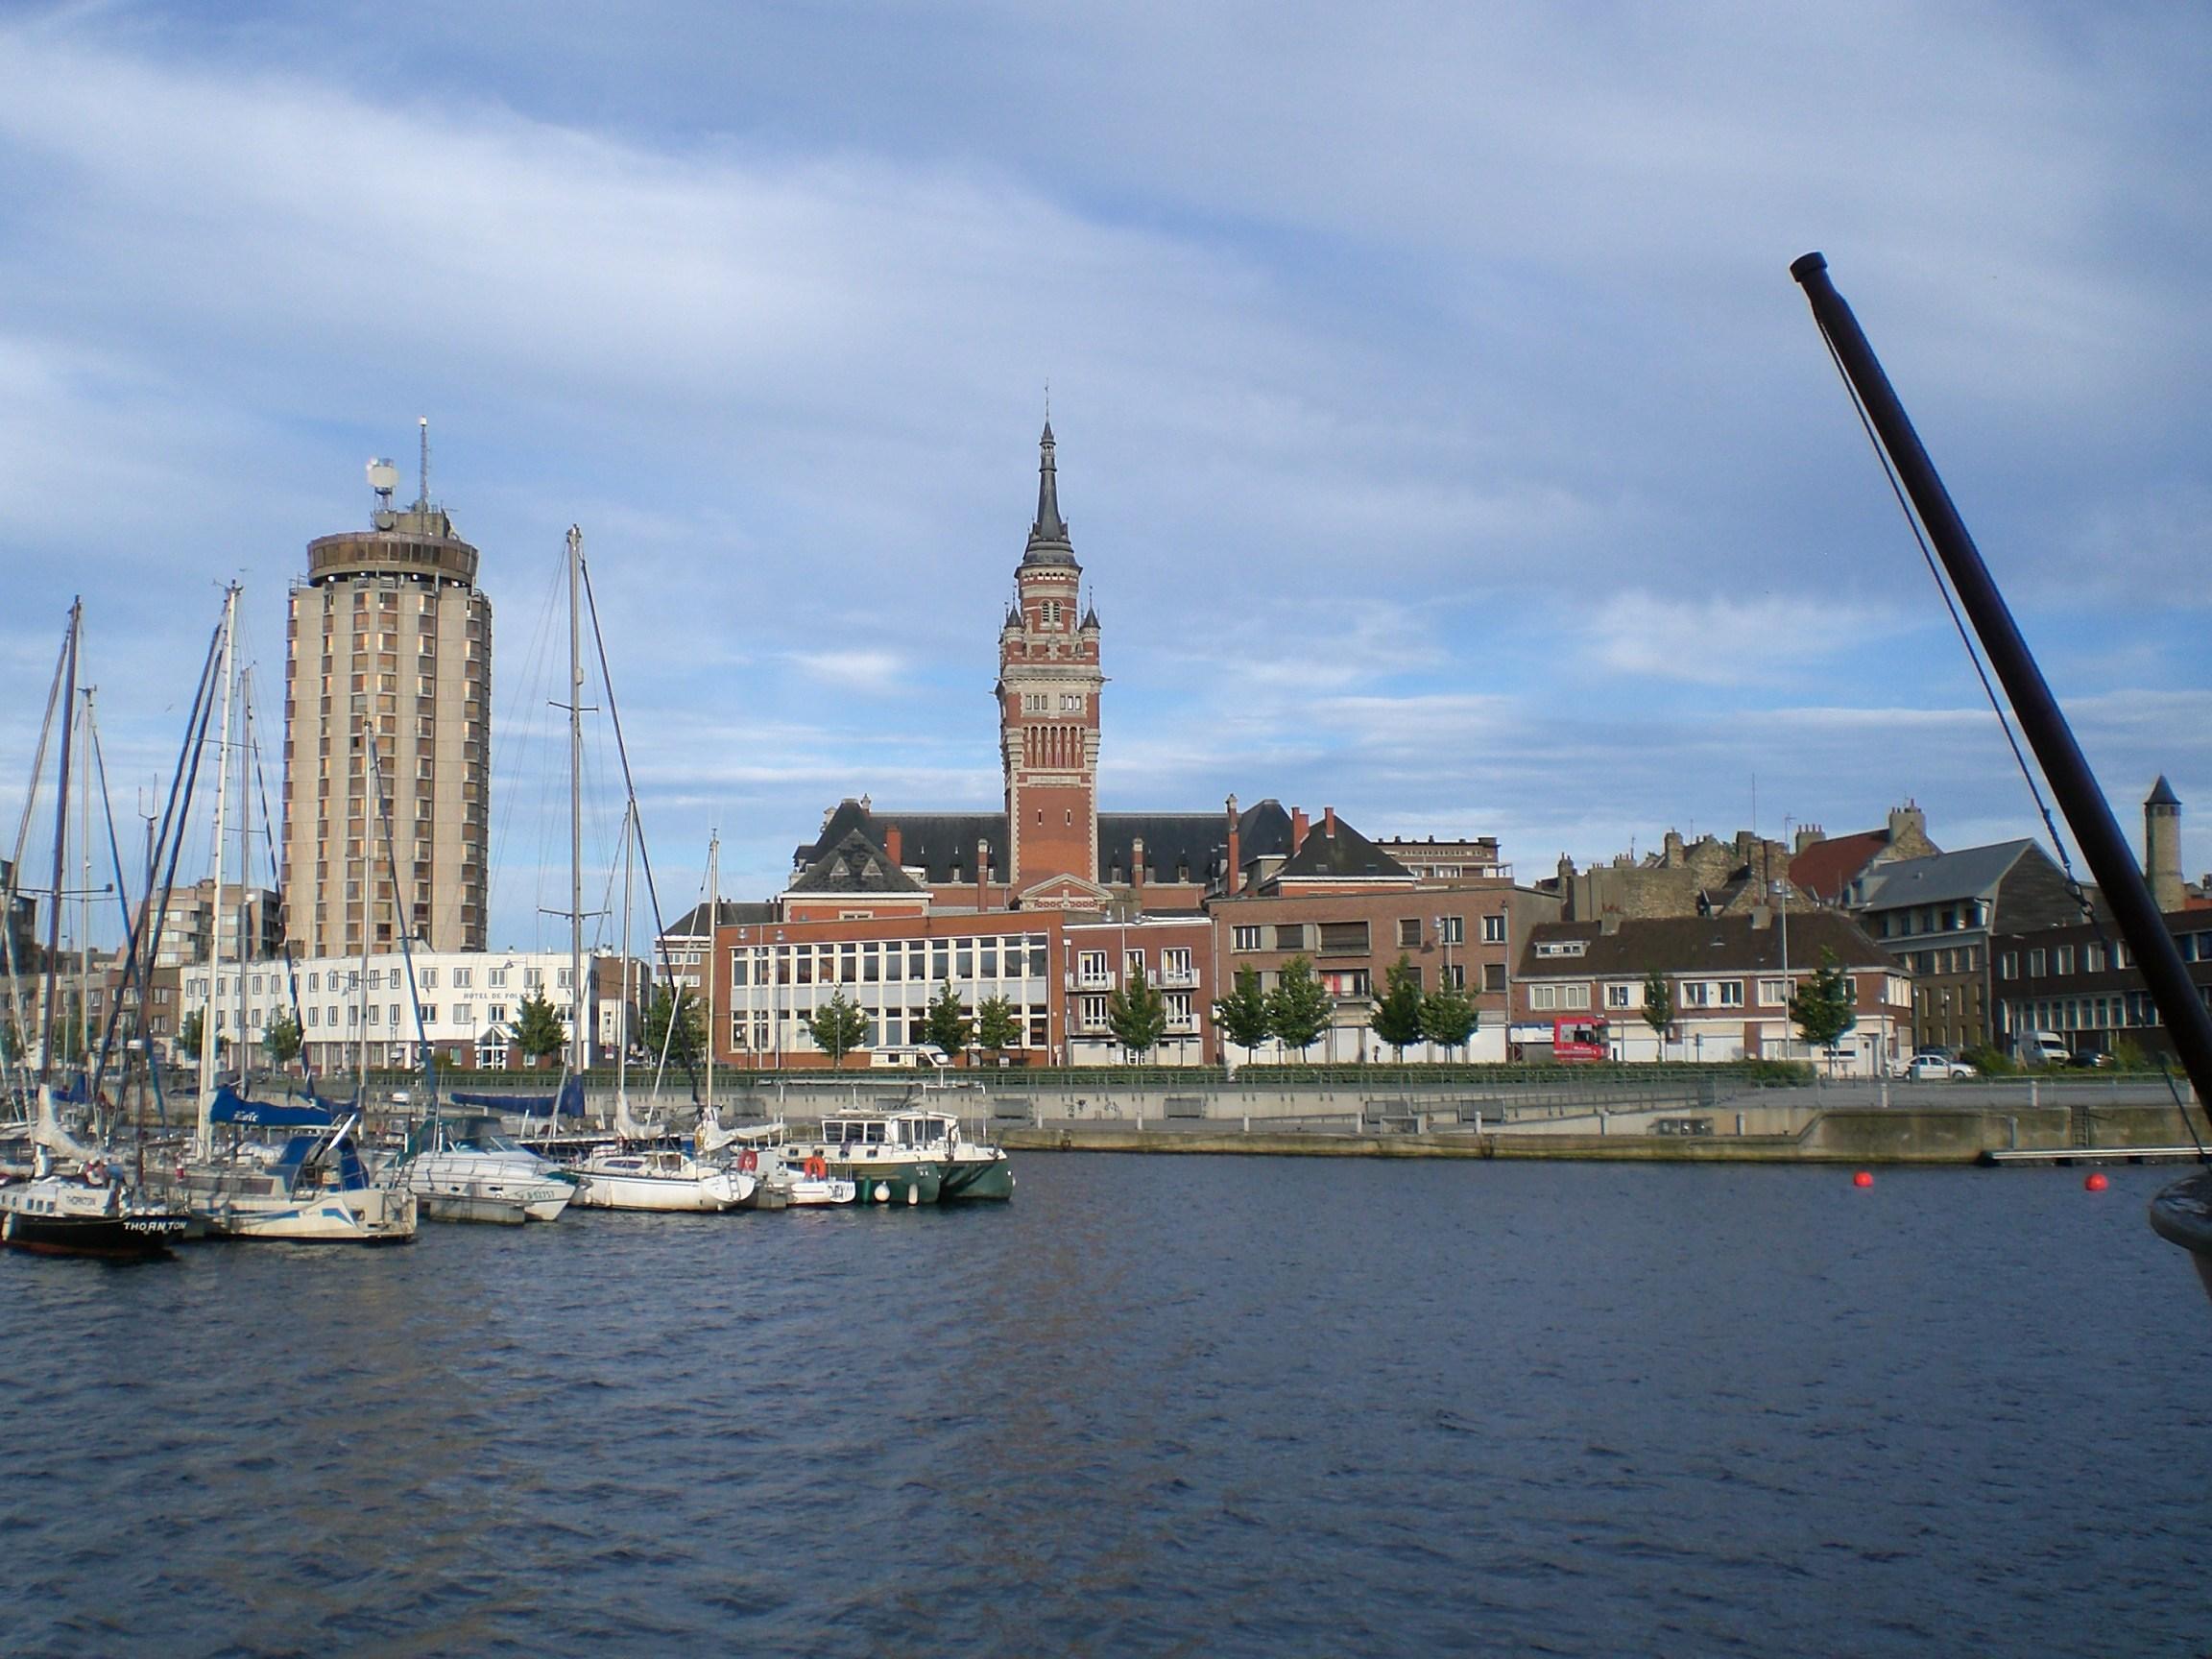 Dunkerque le grand port fran ais de la mer du nord lcff - Mobilier de france dunkerque ...